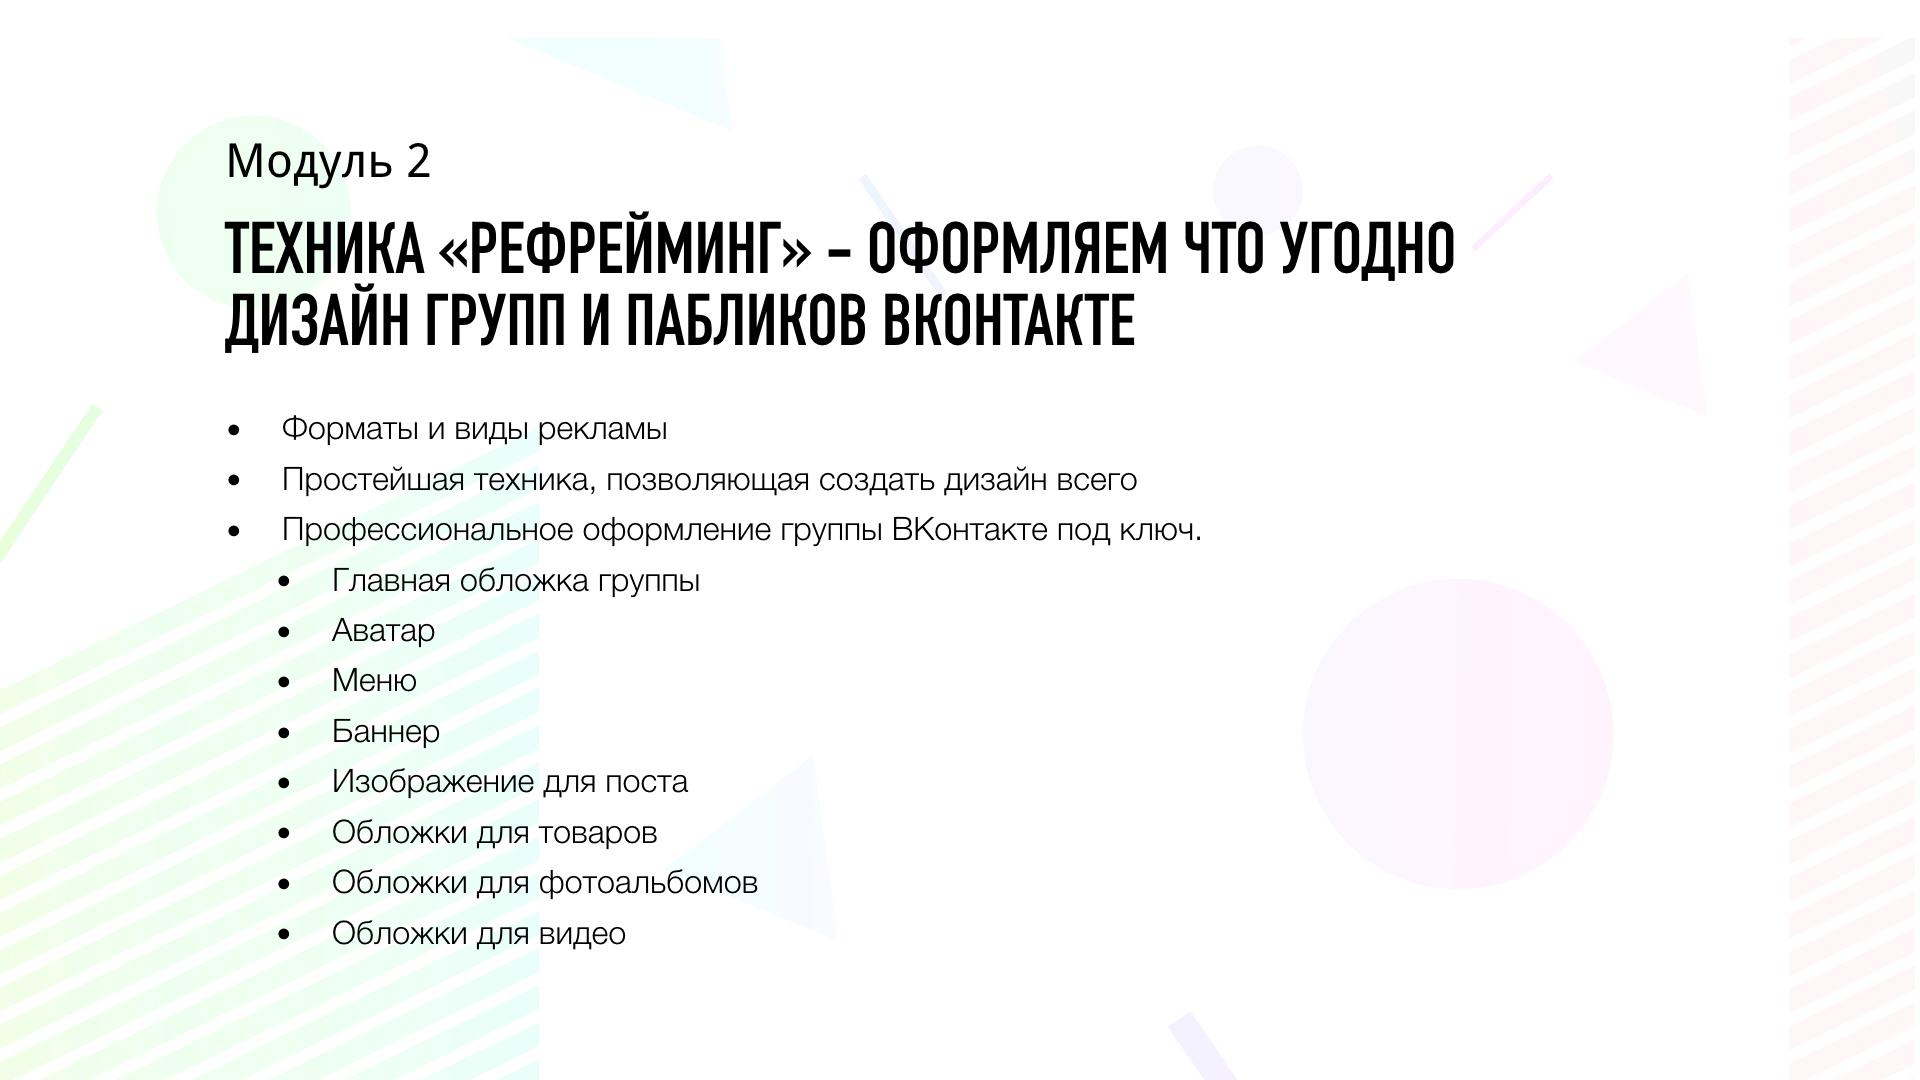 2019-11-16_11-51-13